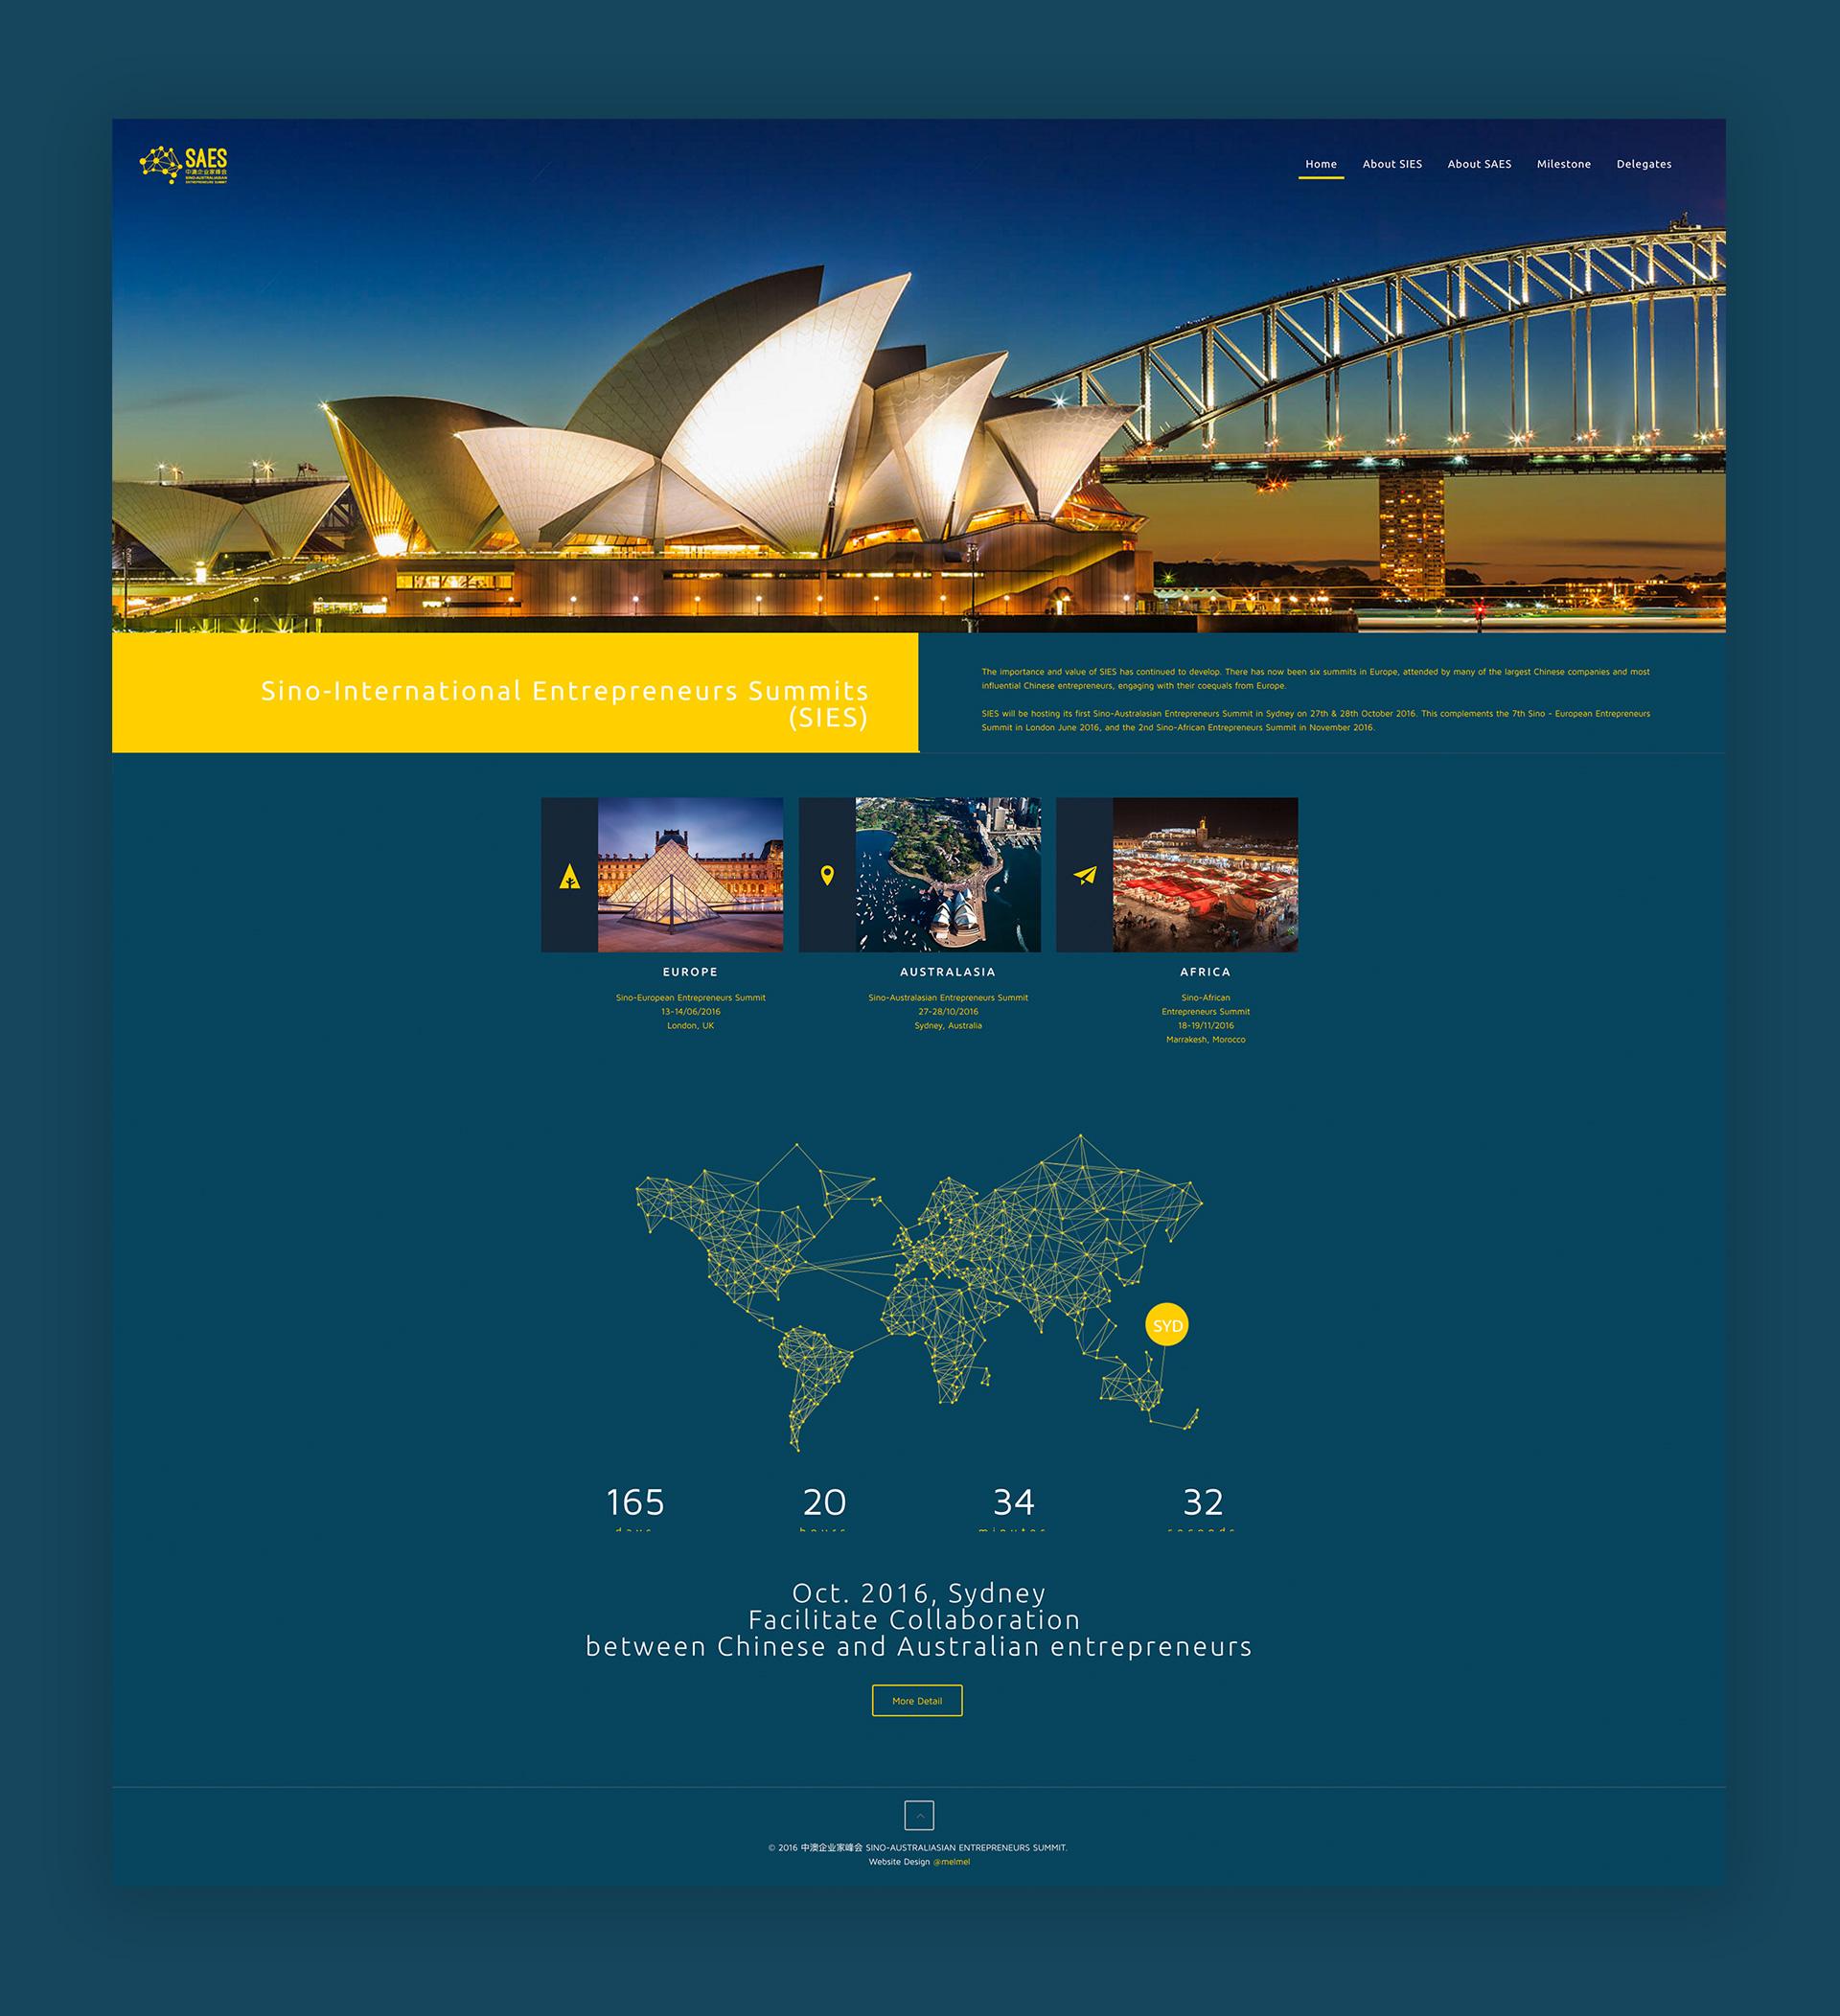 summit conference brand visual design by Z Creative Studio Branding & Graphic Design Melbourne